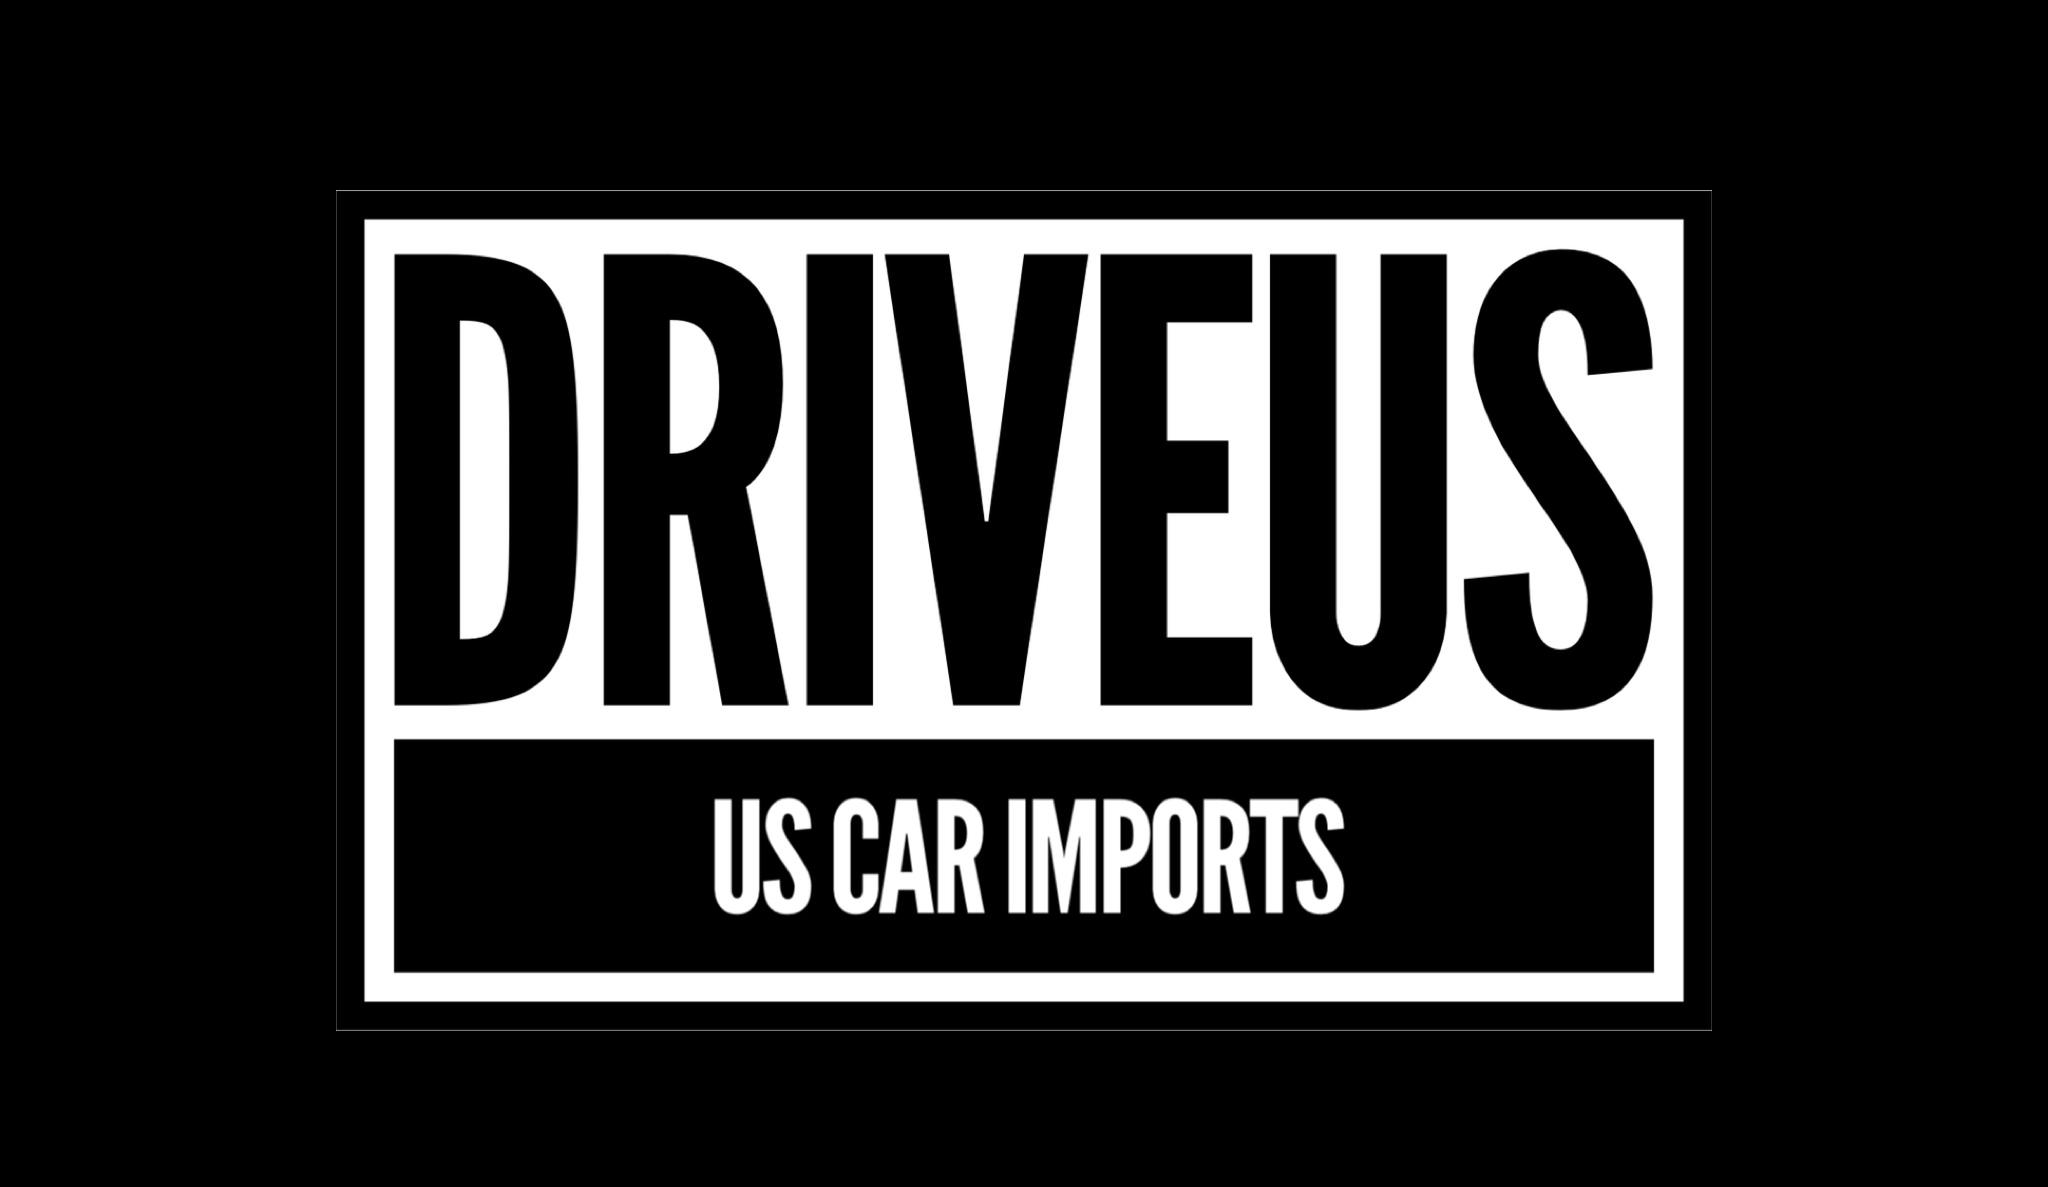 DriveUs